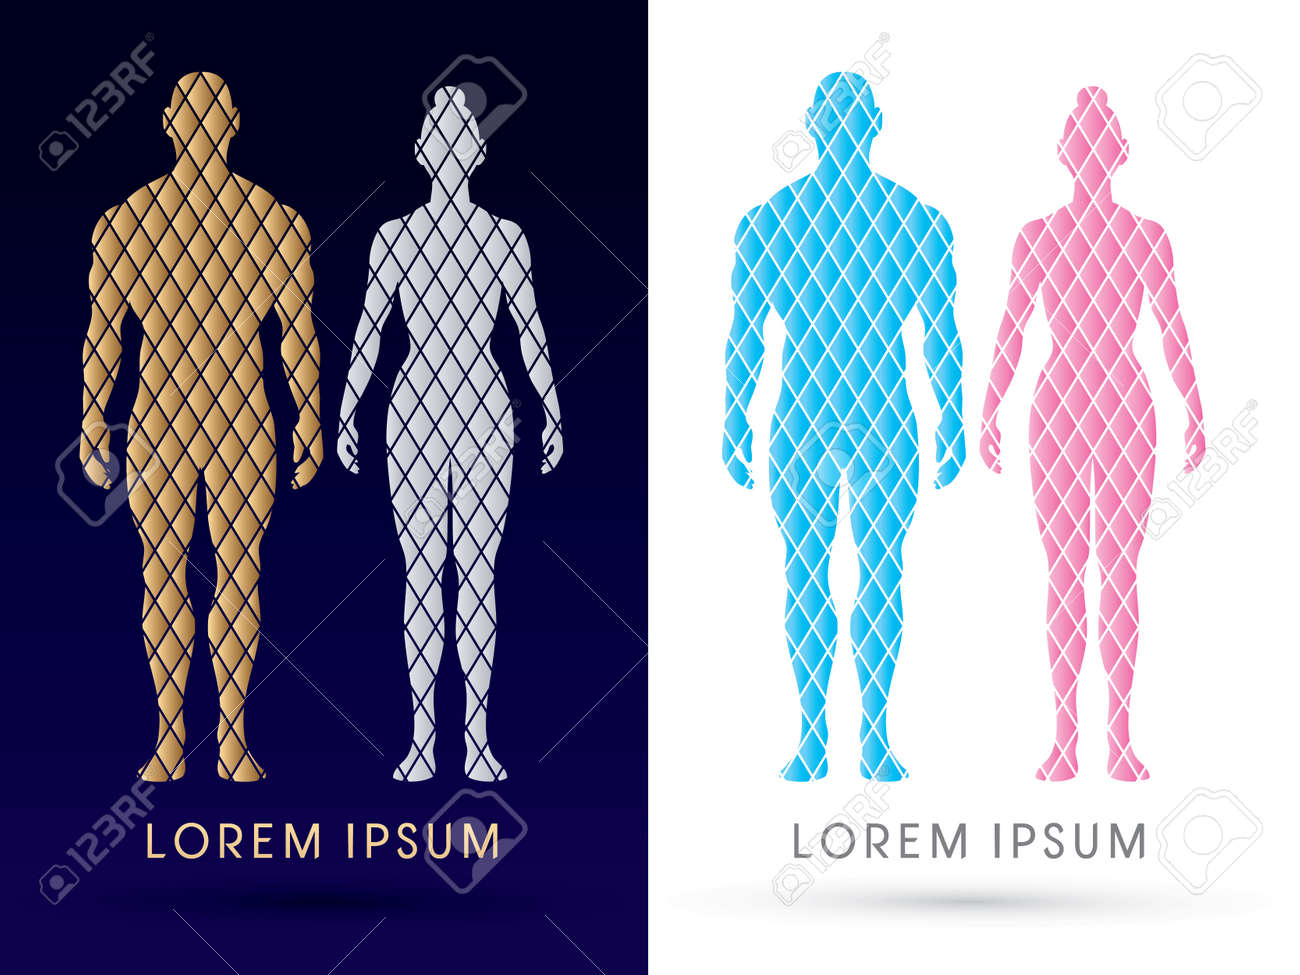 Male And Female Anatomy, Human Body, Full Body, Designed Using ...